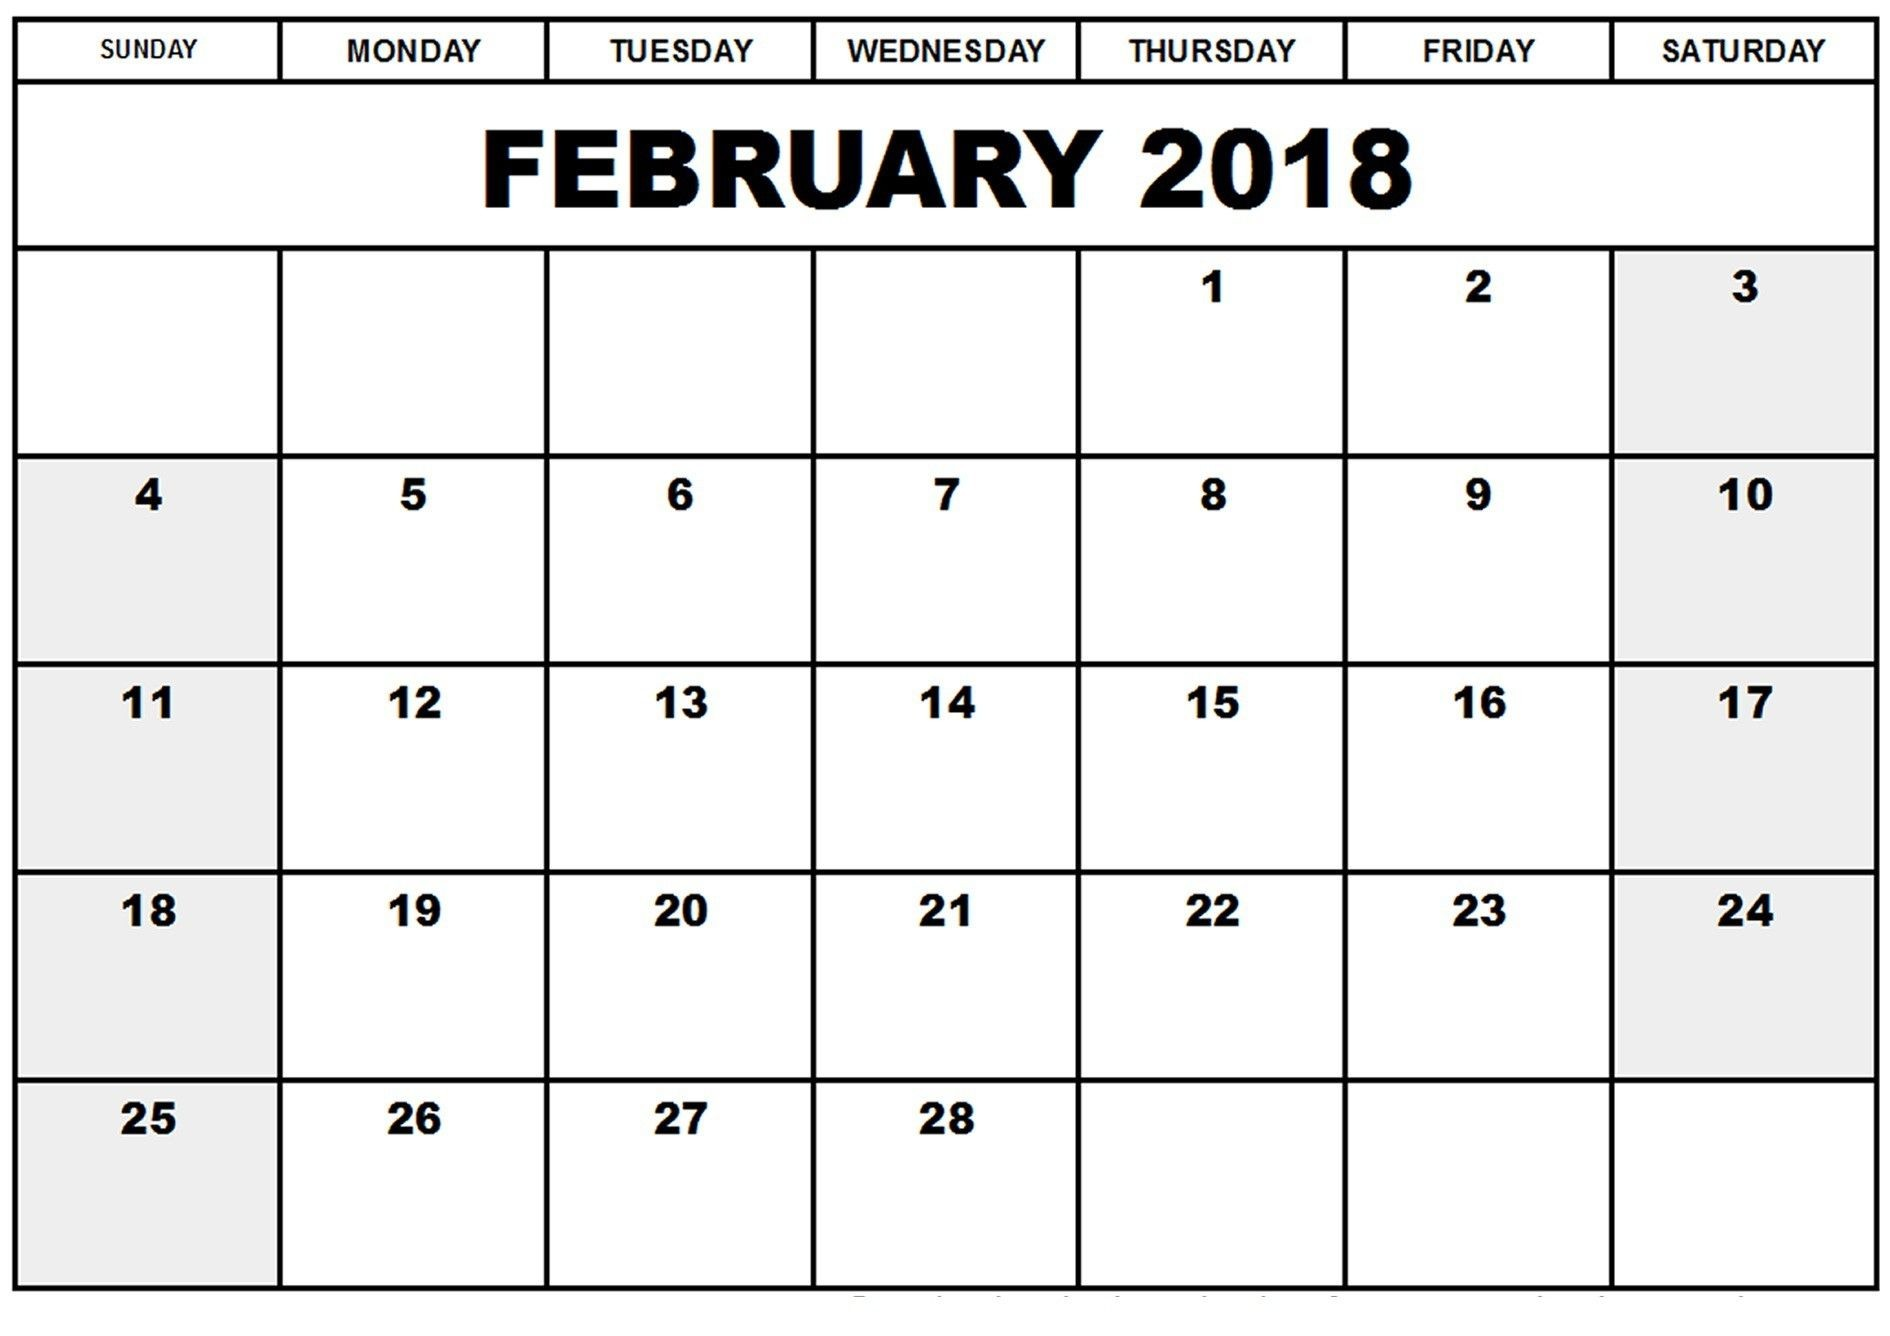 printable february 2019 calendar with holidays feb 2018 calendarfebruary 2019 calendar template printable